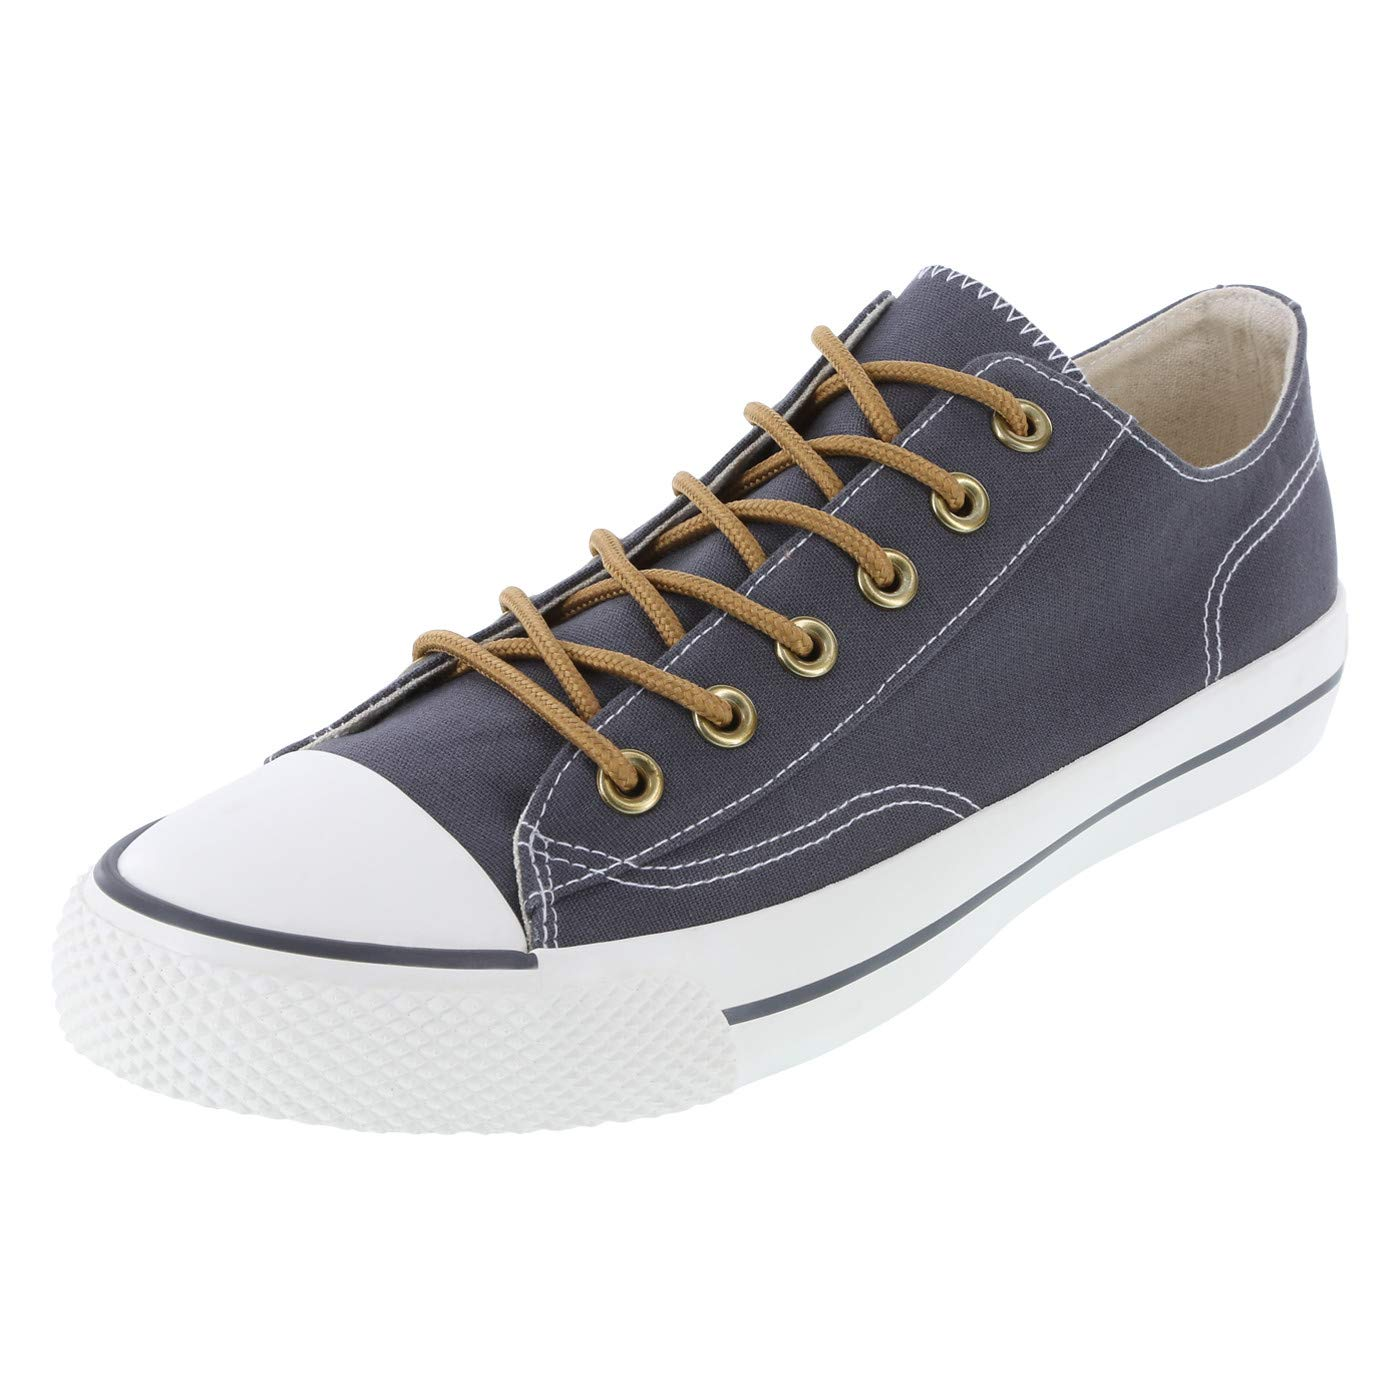 Airwalk Men's Washed Navy Canvas Legacee Sneaker 8